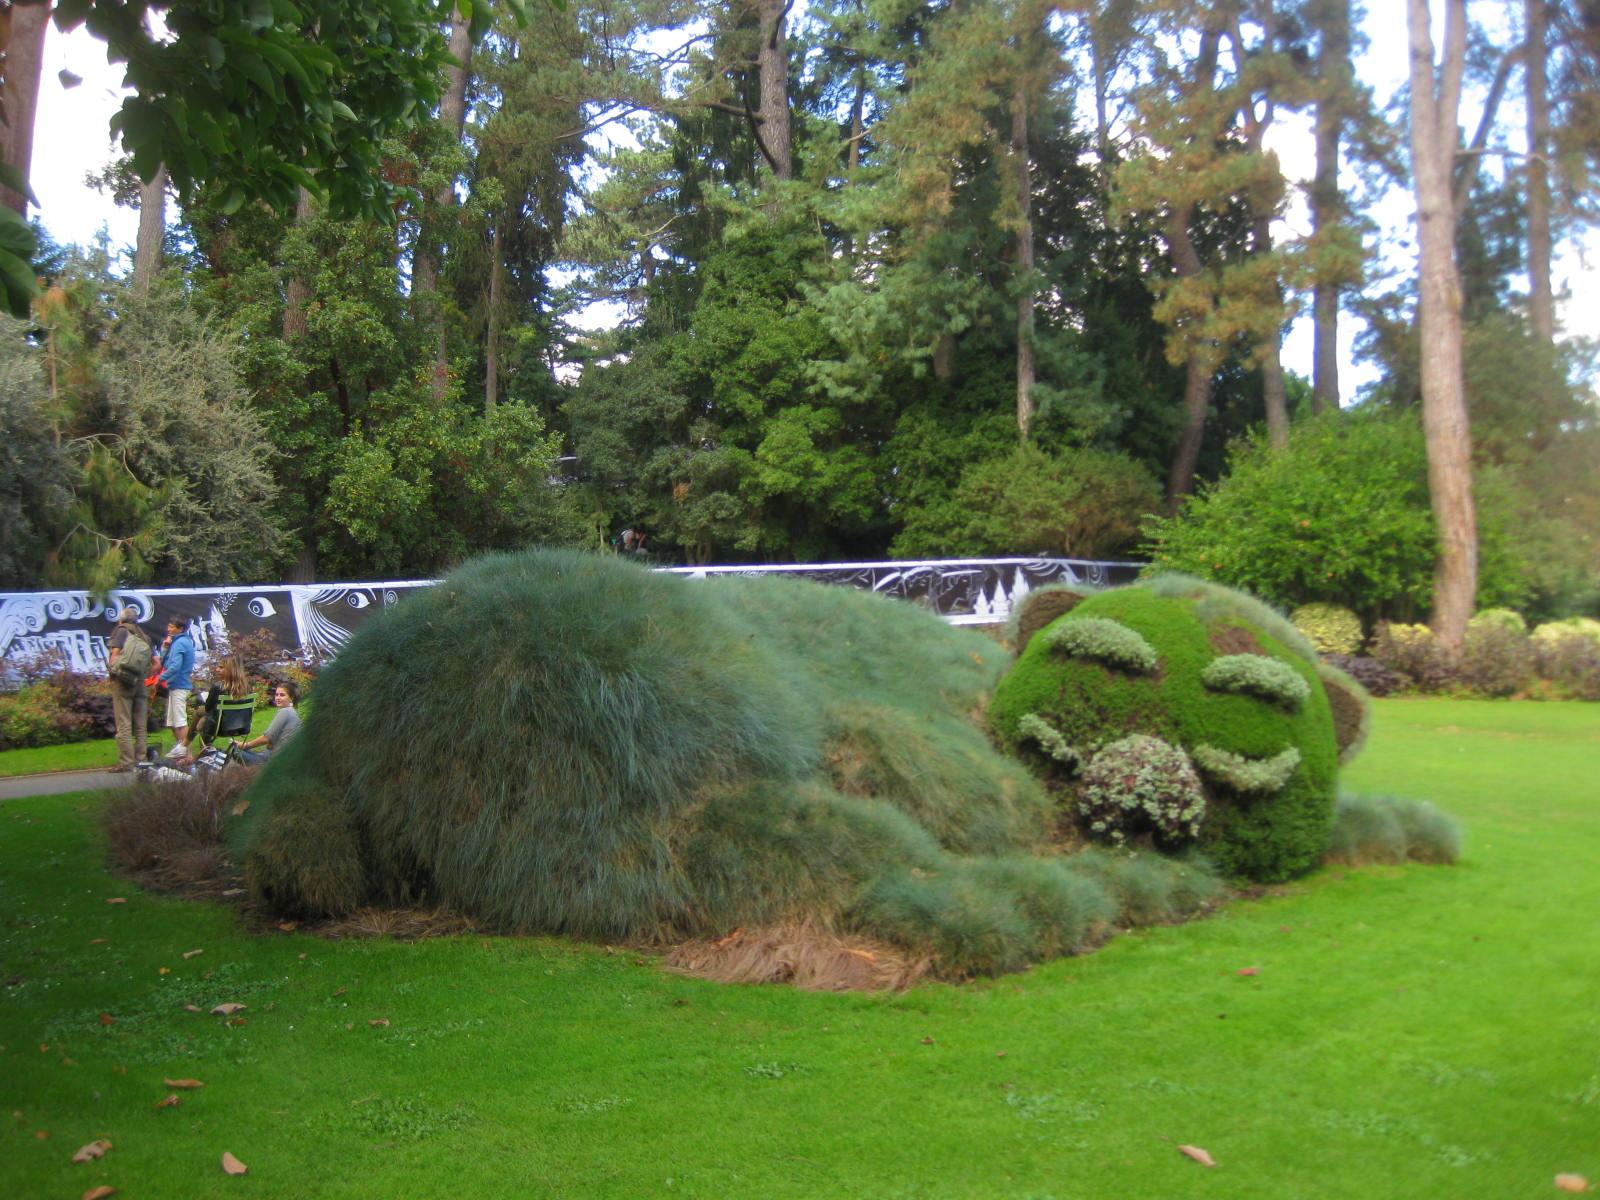 Blog de nantes septembre 2016 for Jardin des plantes nantes 2016